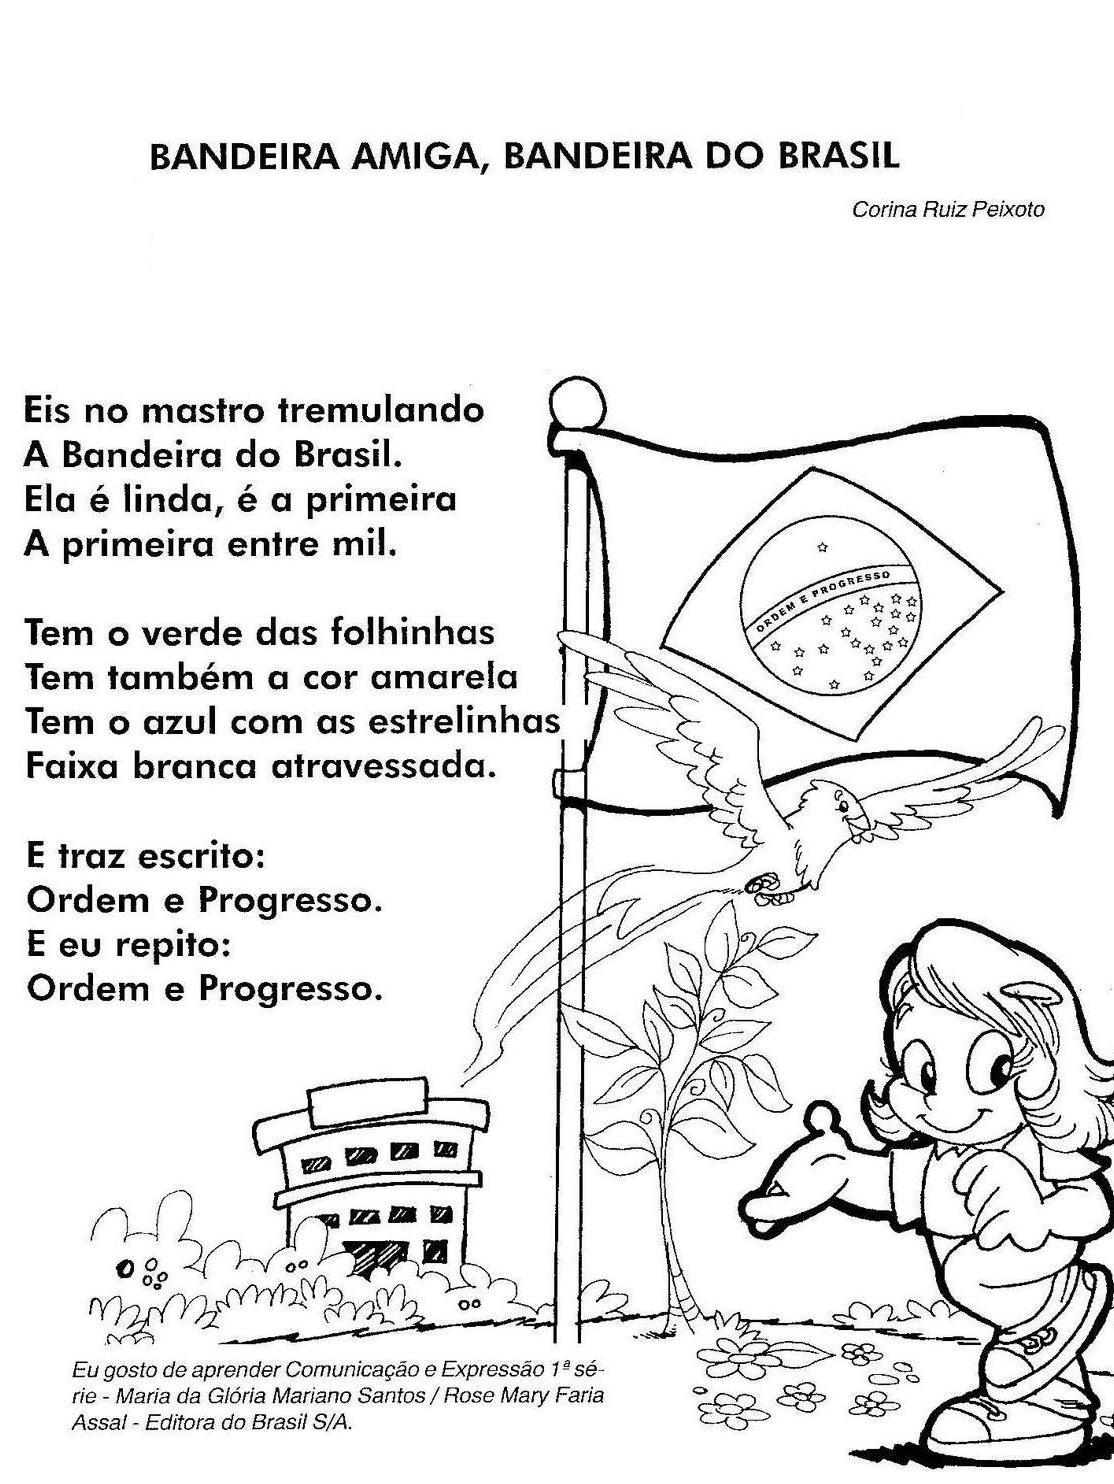 Download image Poesia Ilustrada Bandeira Amiga PC, Android, iPhone and